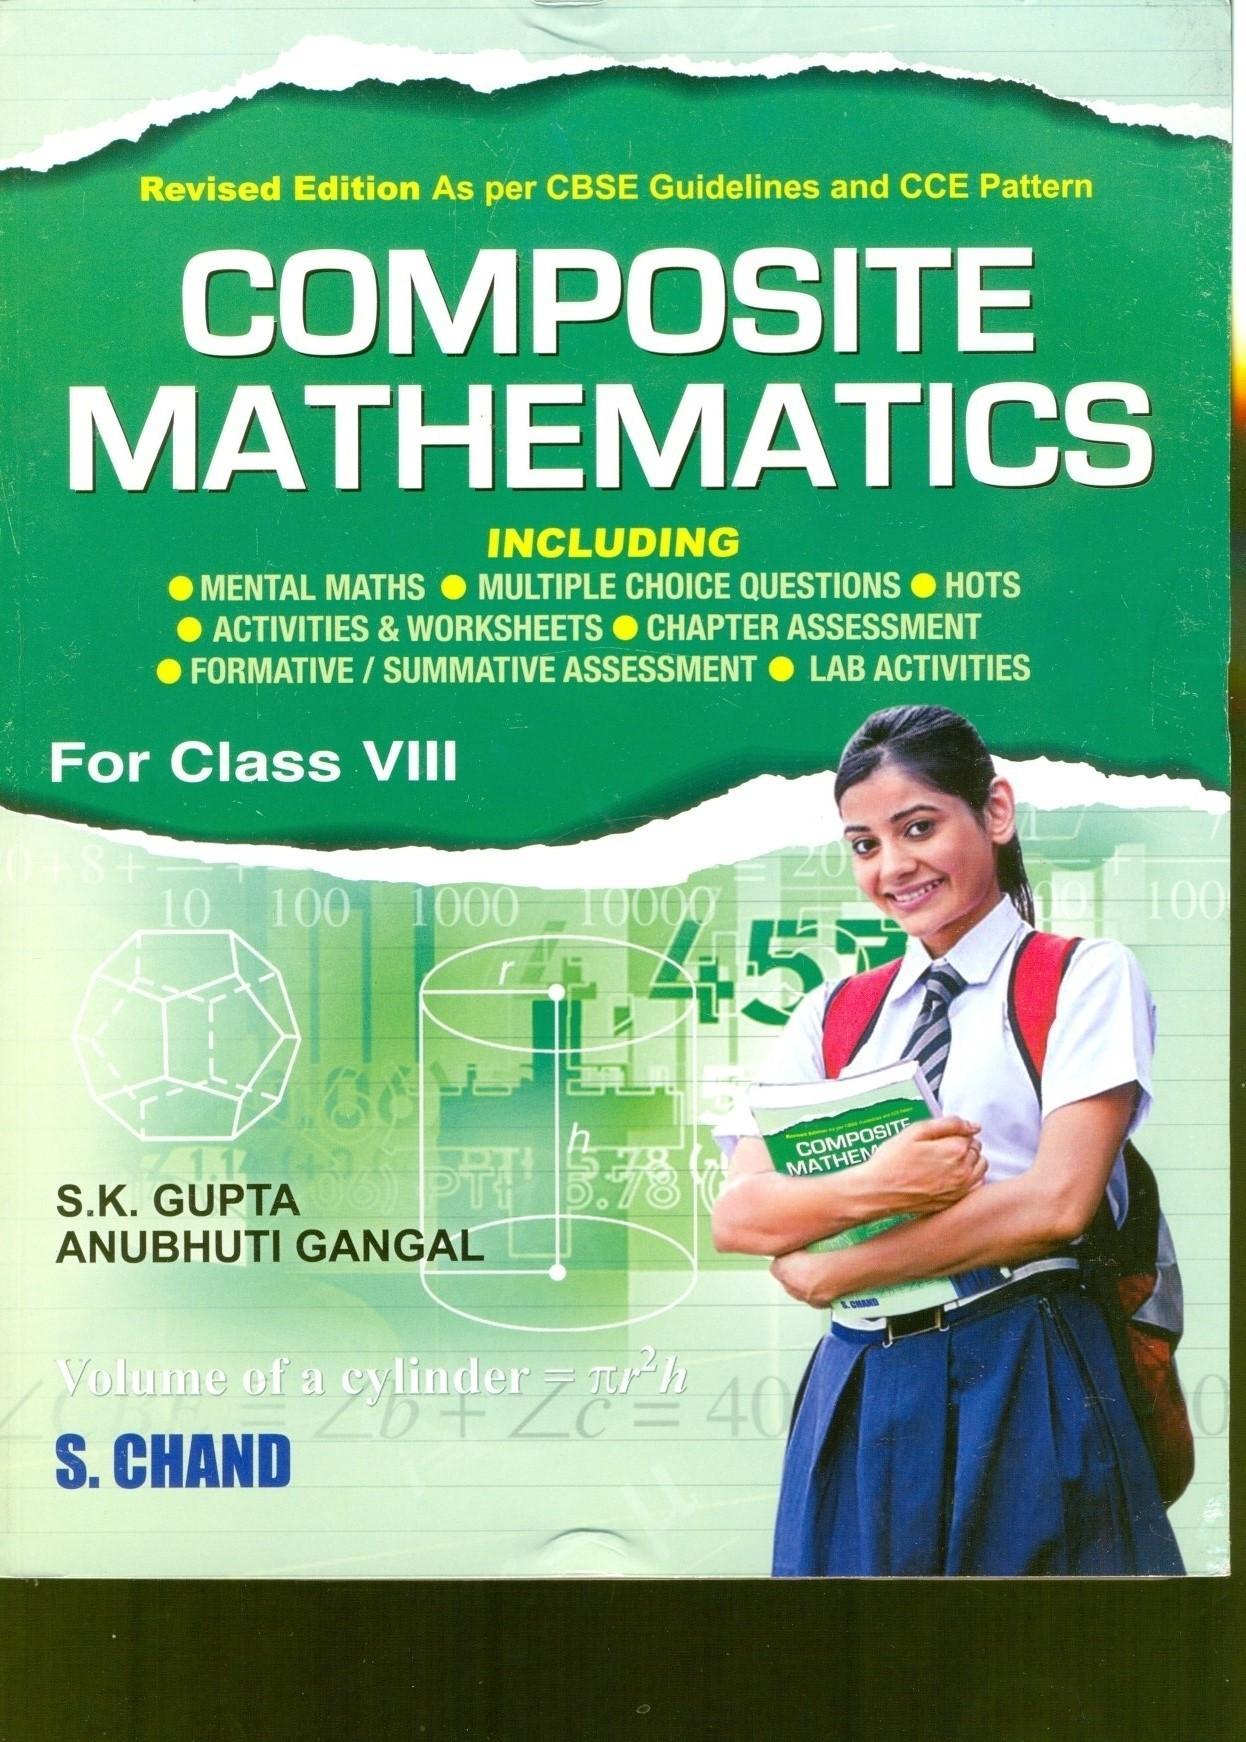 composite mathematics for year 8 by anubhuti gangal s k gupta price rh shoponline payback in